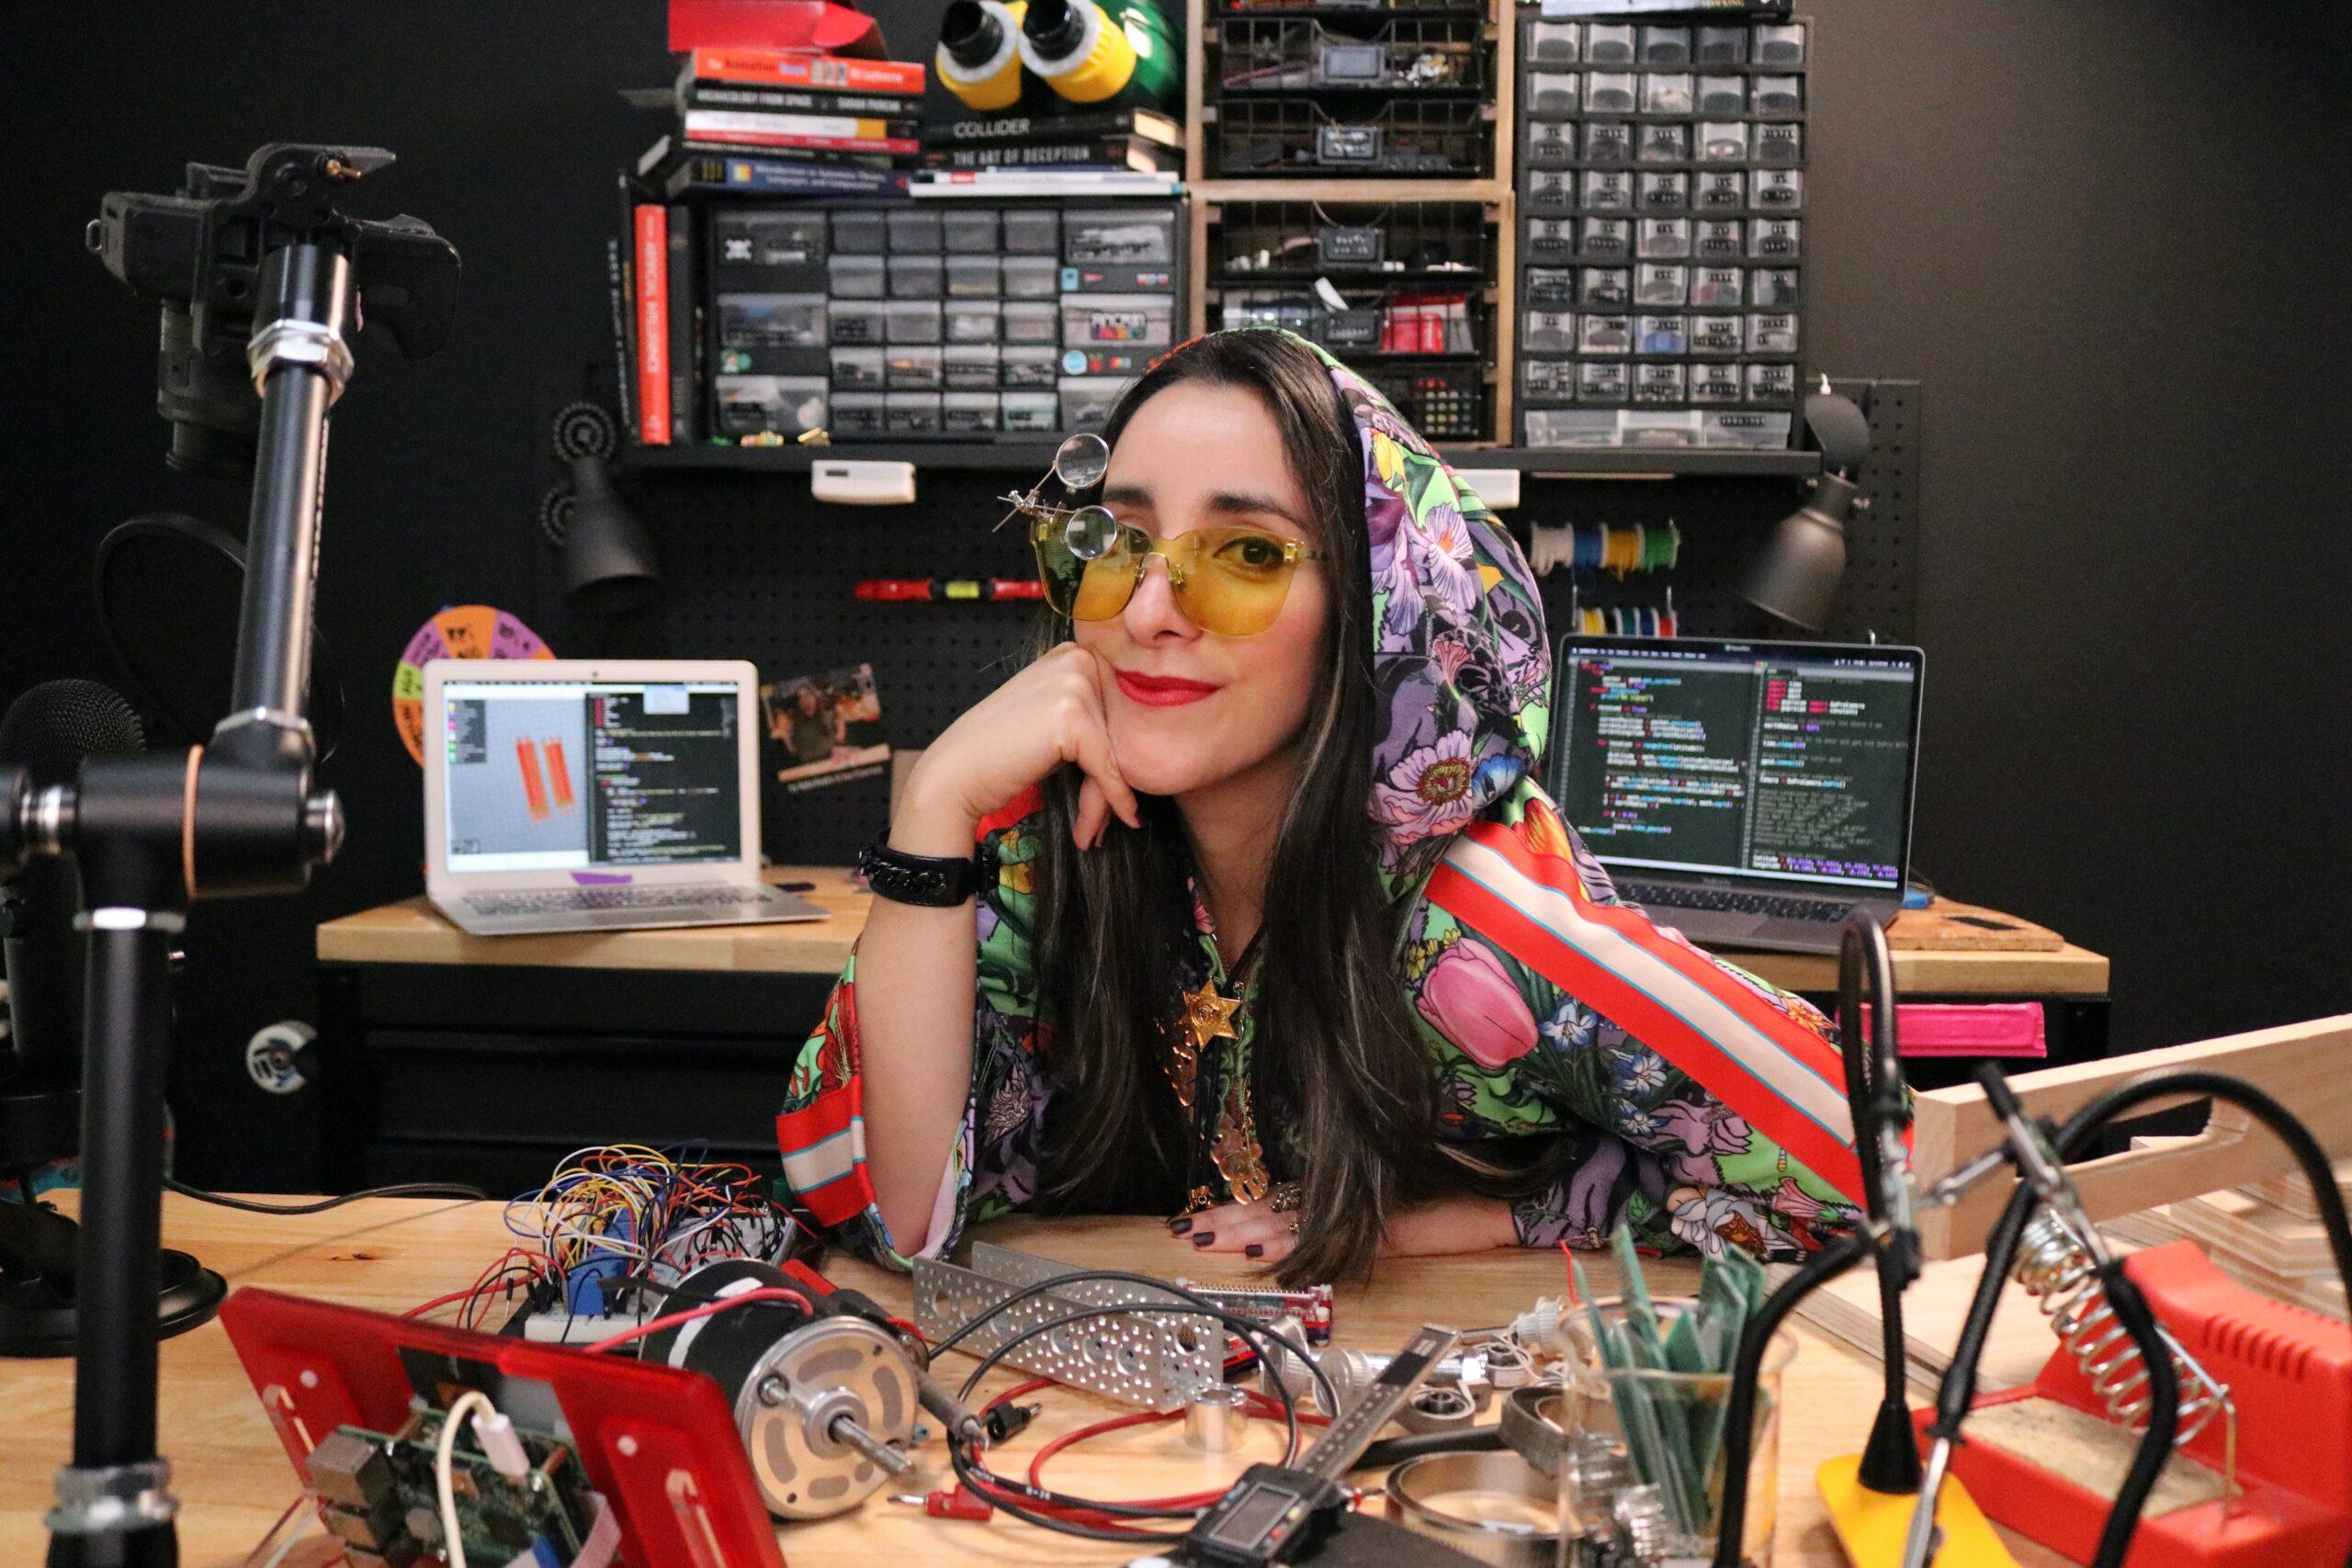 estefannie at her desk in colourful hoodie